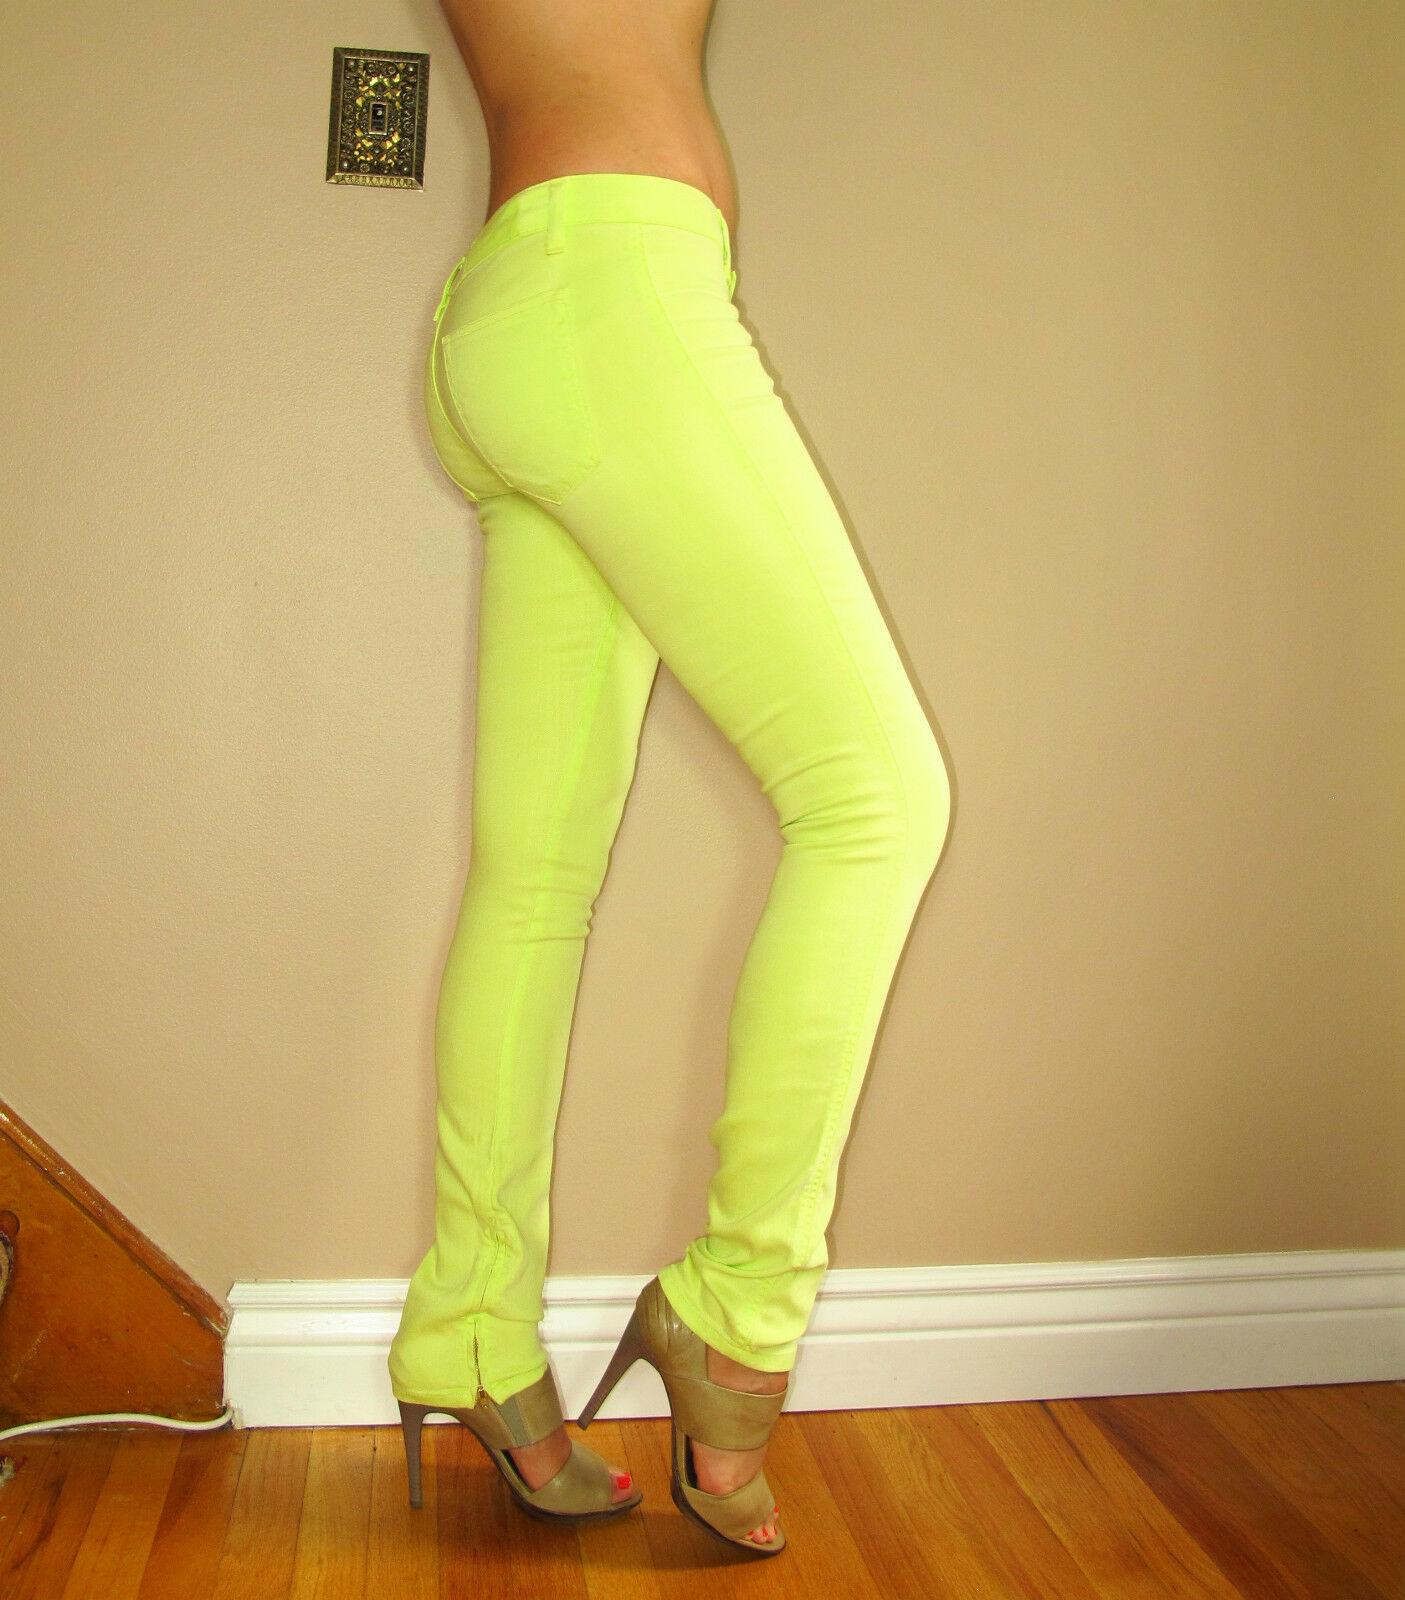 Tessuto Elizabeth&james Mick Aderente Neon verde Lime Zip Jeans Lunghi 26 Nuovo